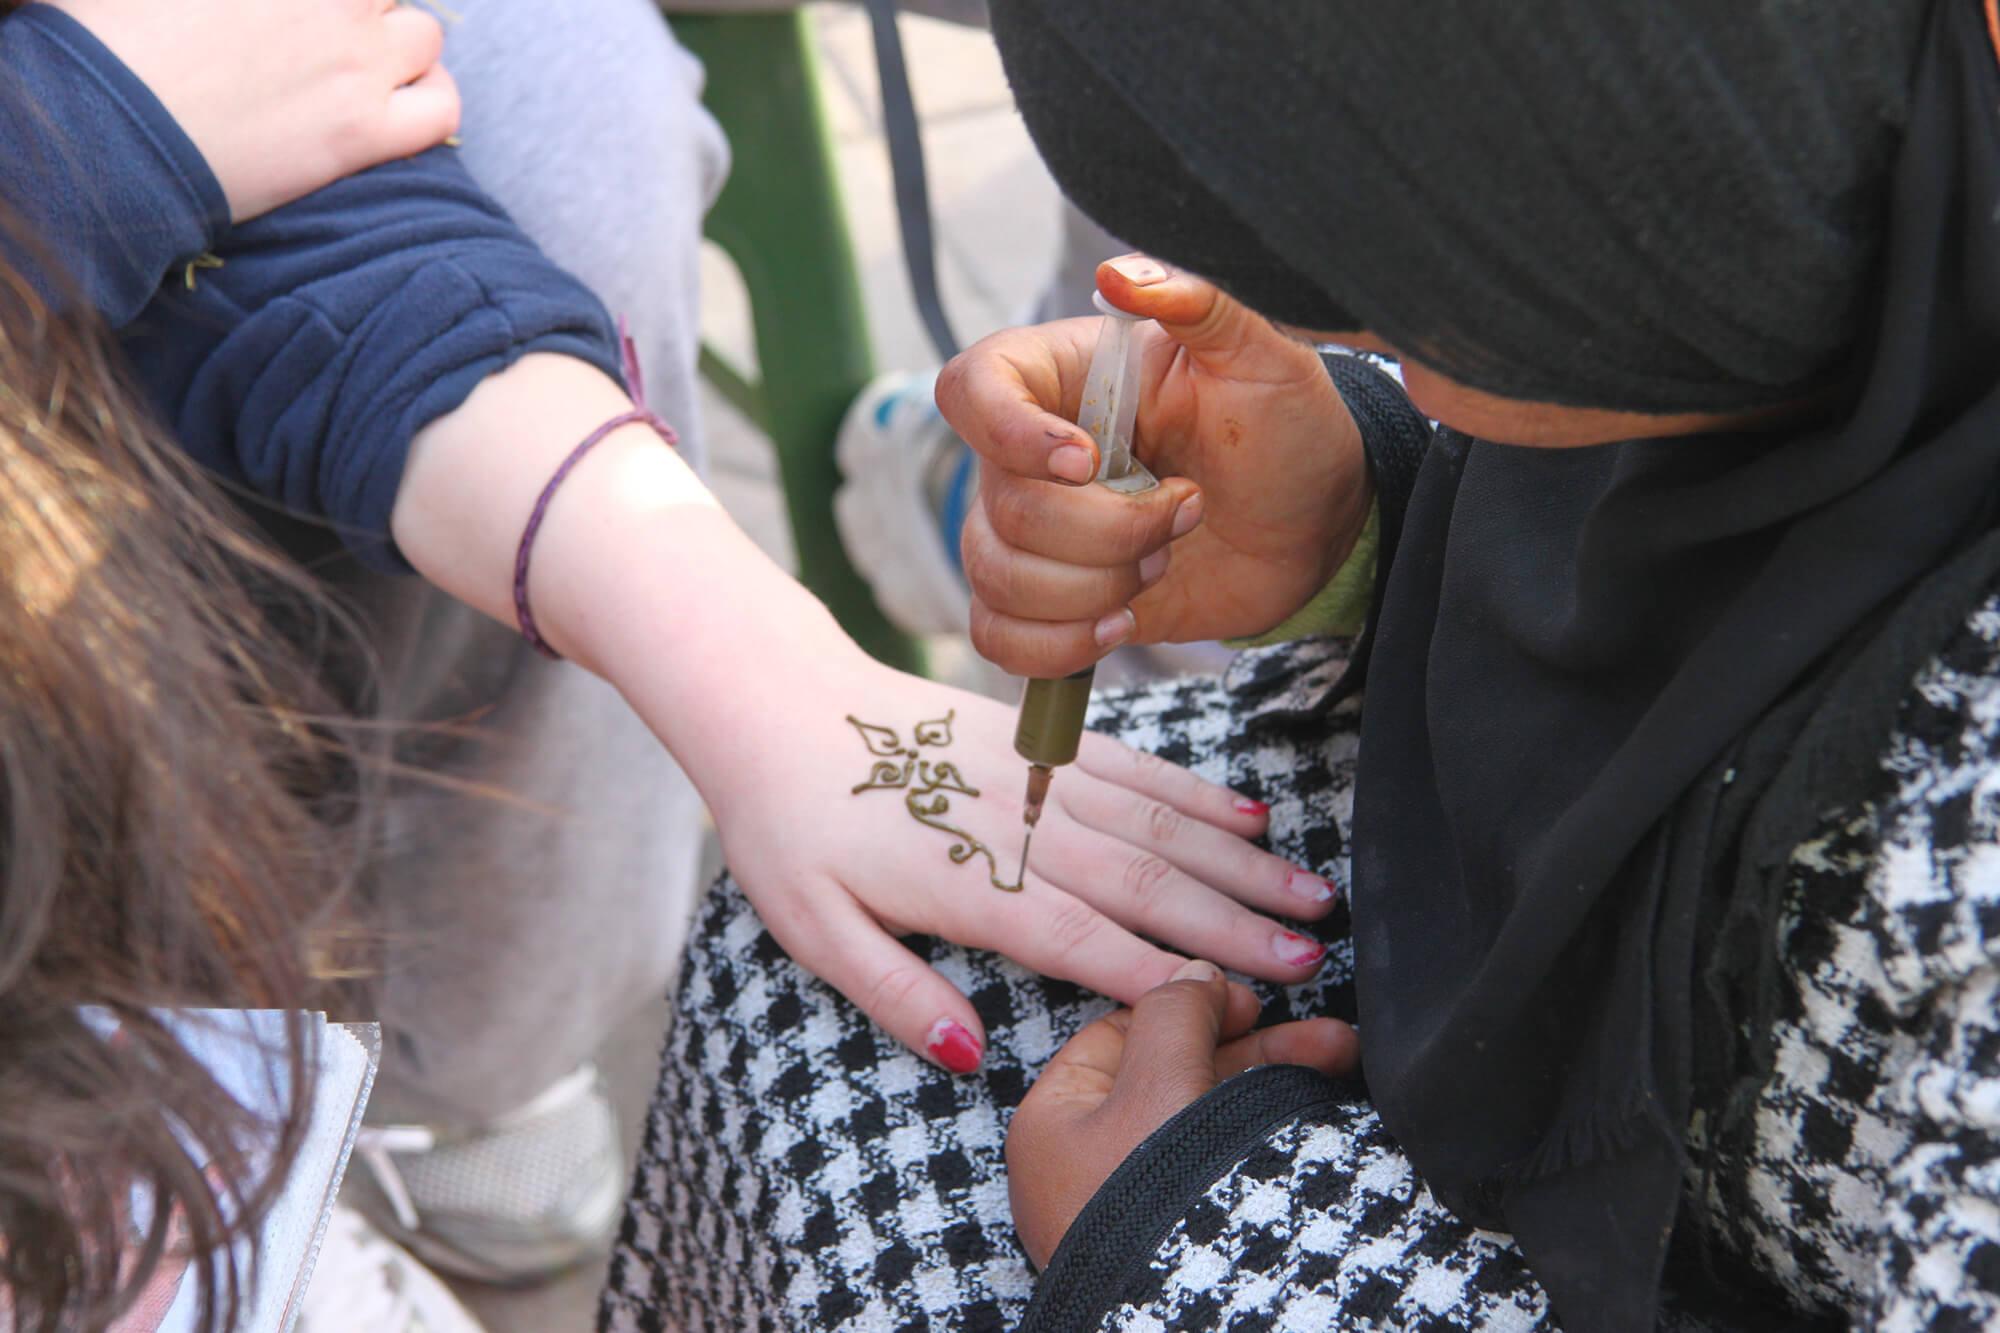 Sahara Desert Tour - Kids Activities in and around Morocco - Experience Henna Art